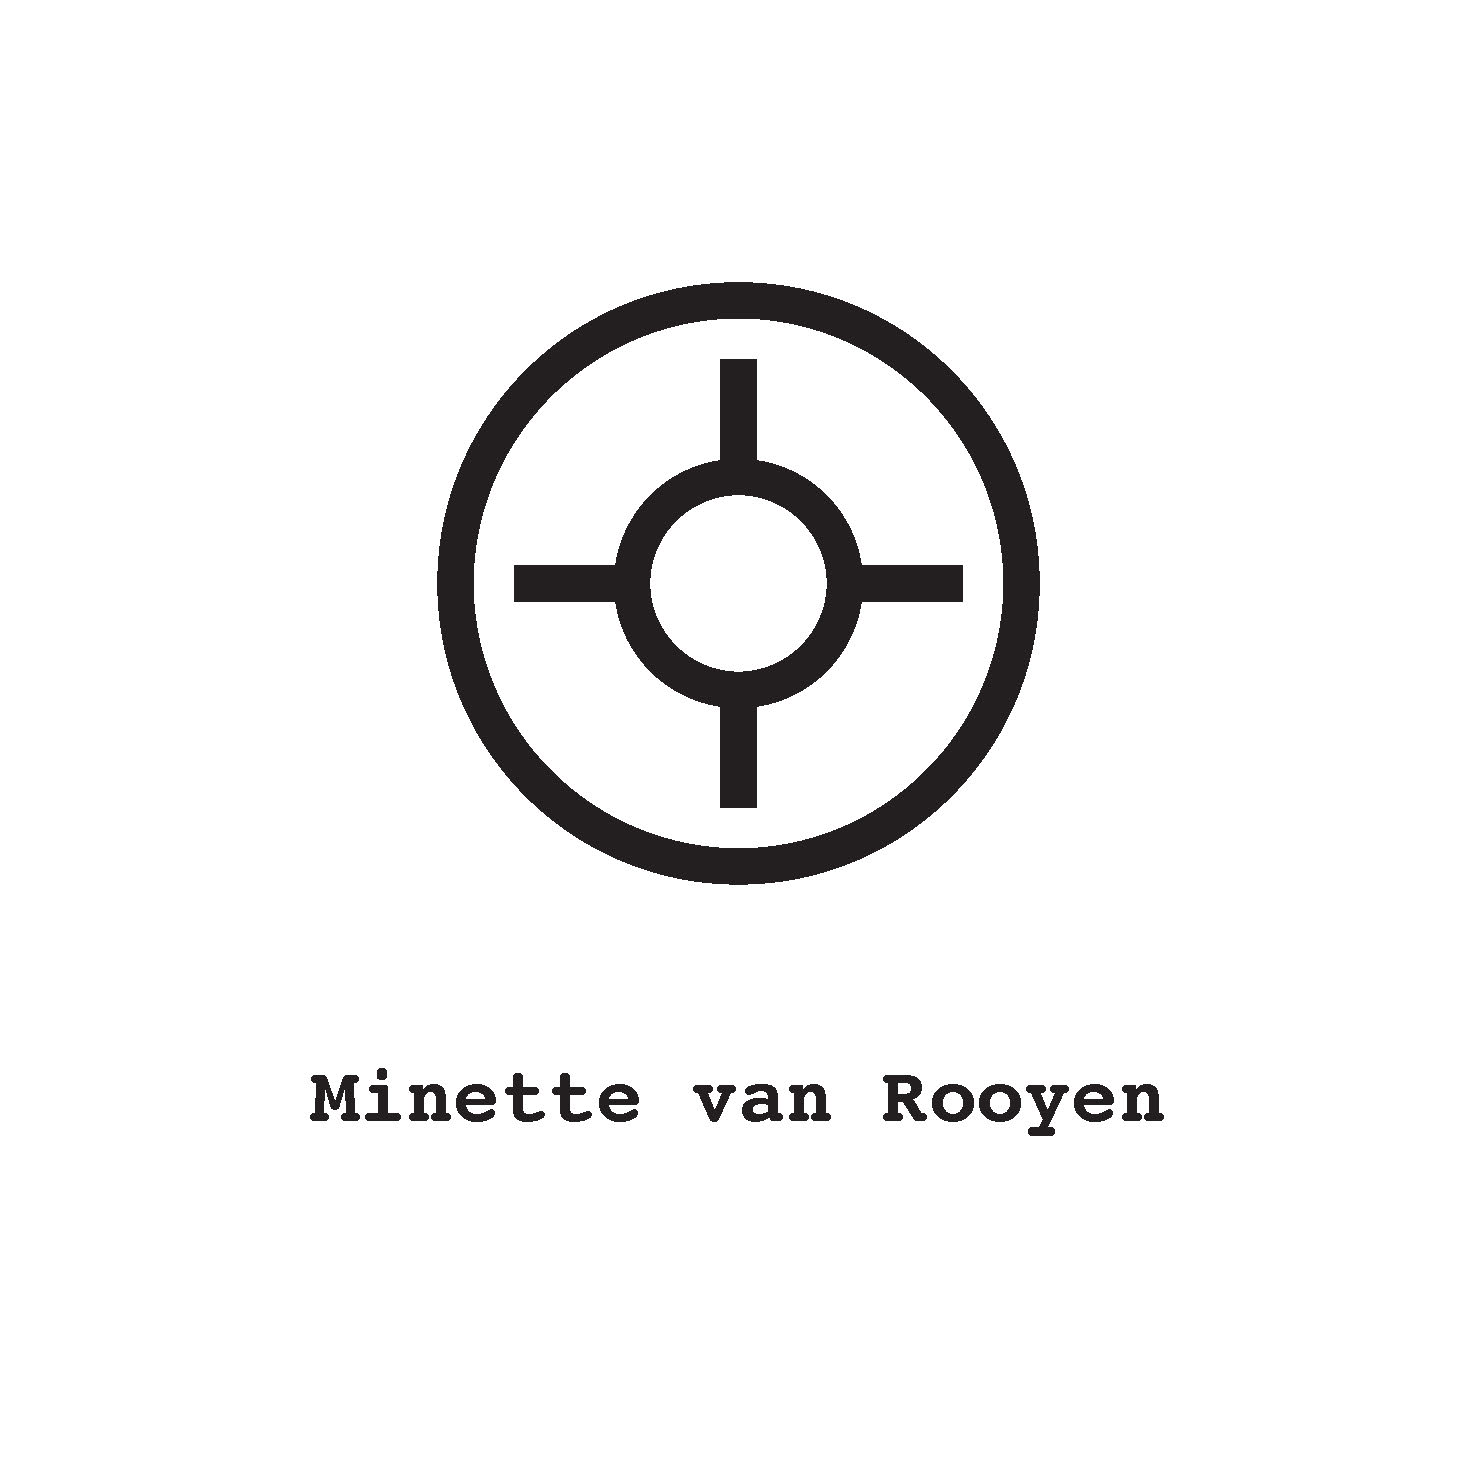 MAP Southafrica - Minette van Rooyen